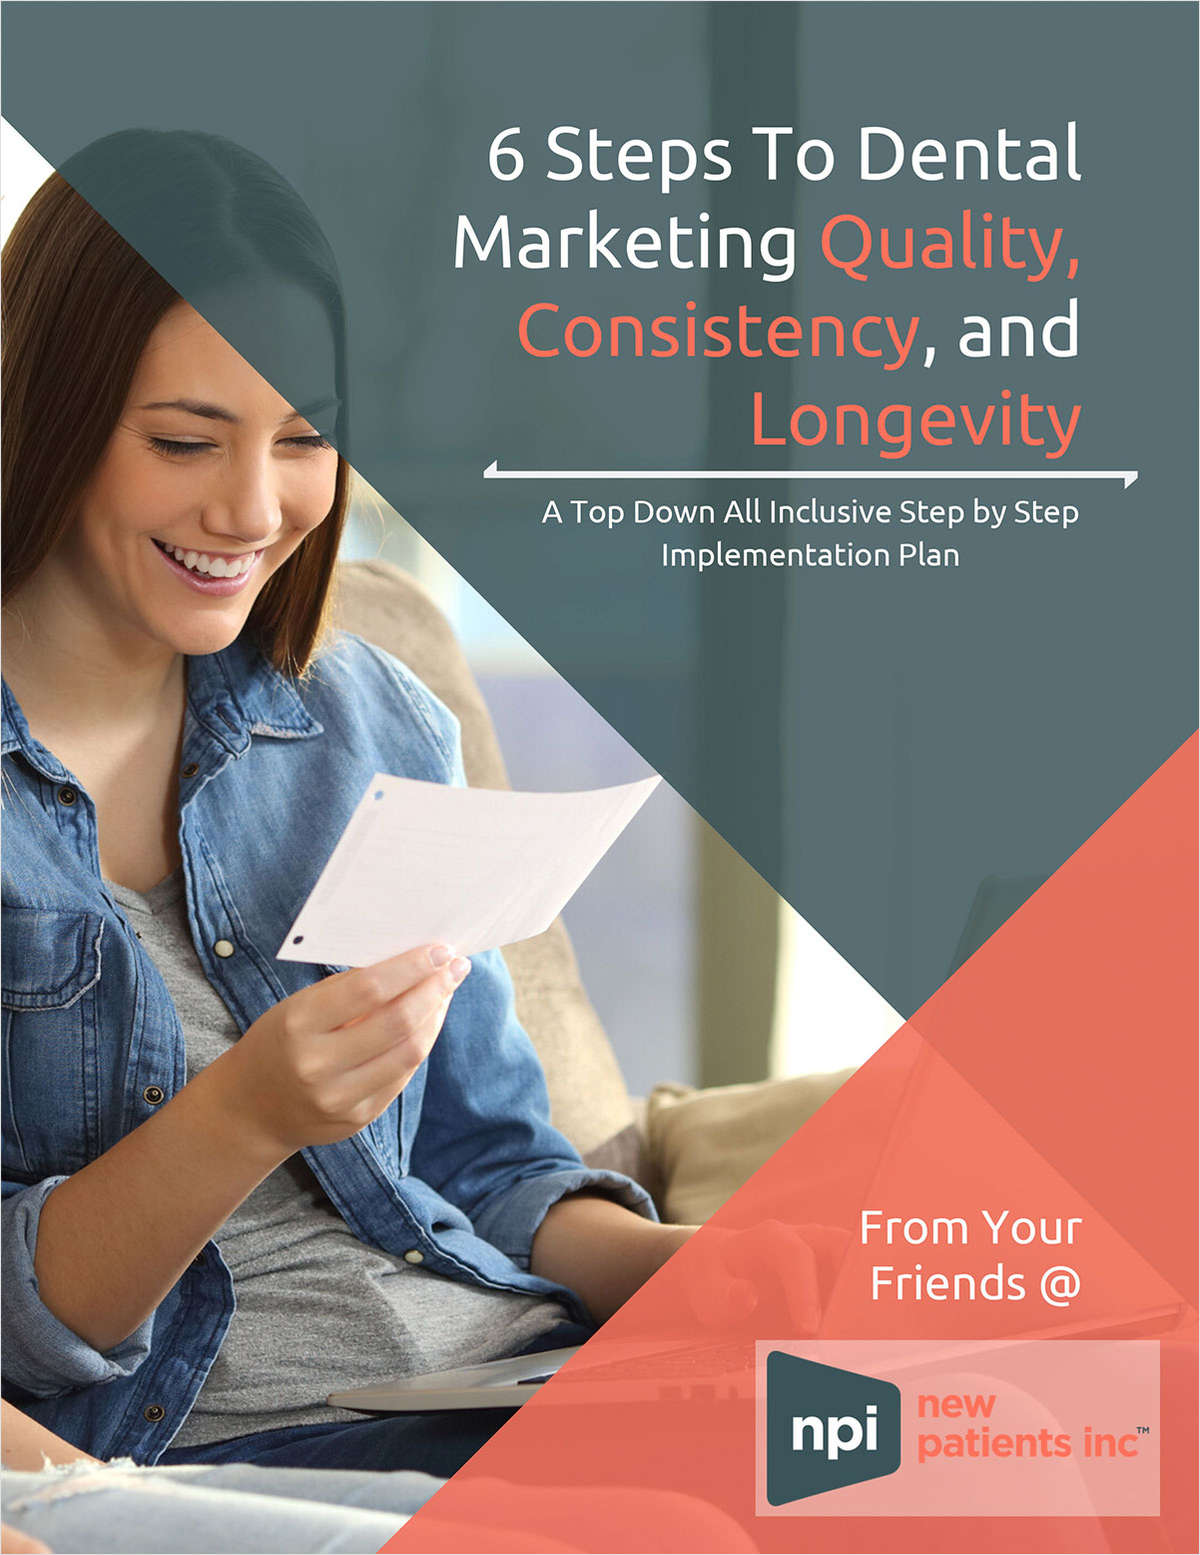 6 Steps to Dental Marketing Quality, Consistency, And Longevity